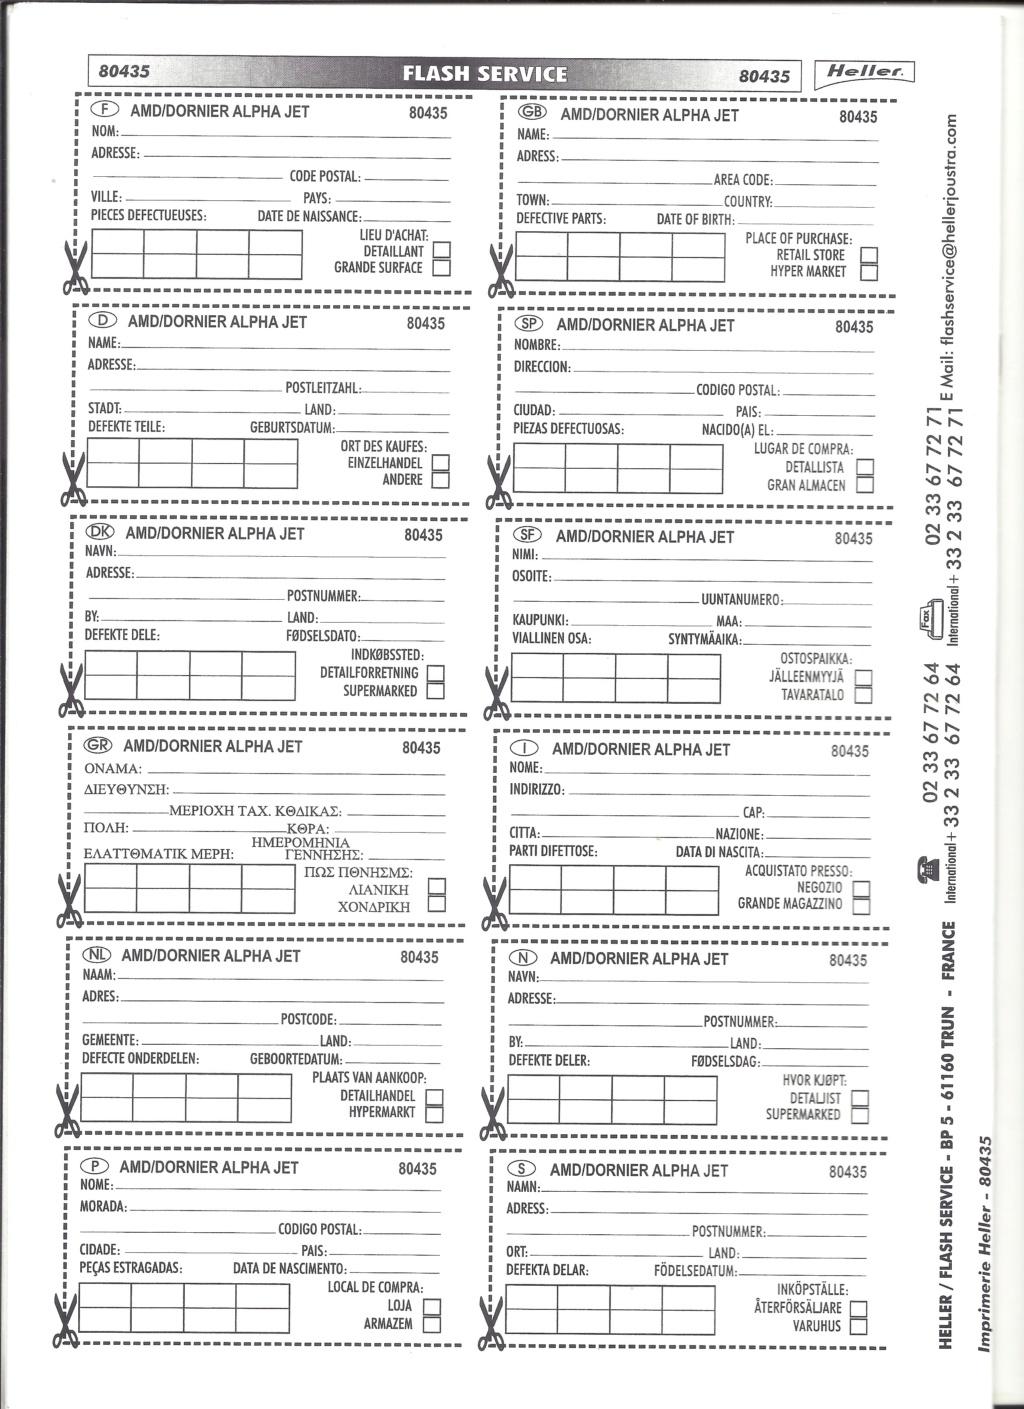 DASSAULT-BREGUET / DORNIER ALPHA JET 1/48ème Réf 80435 Notice Helle673